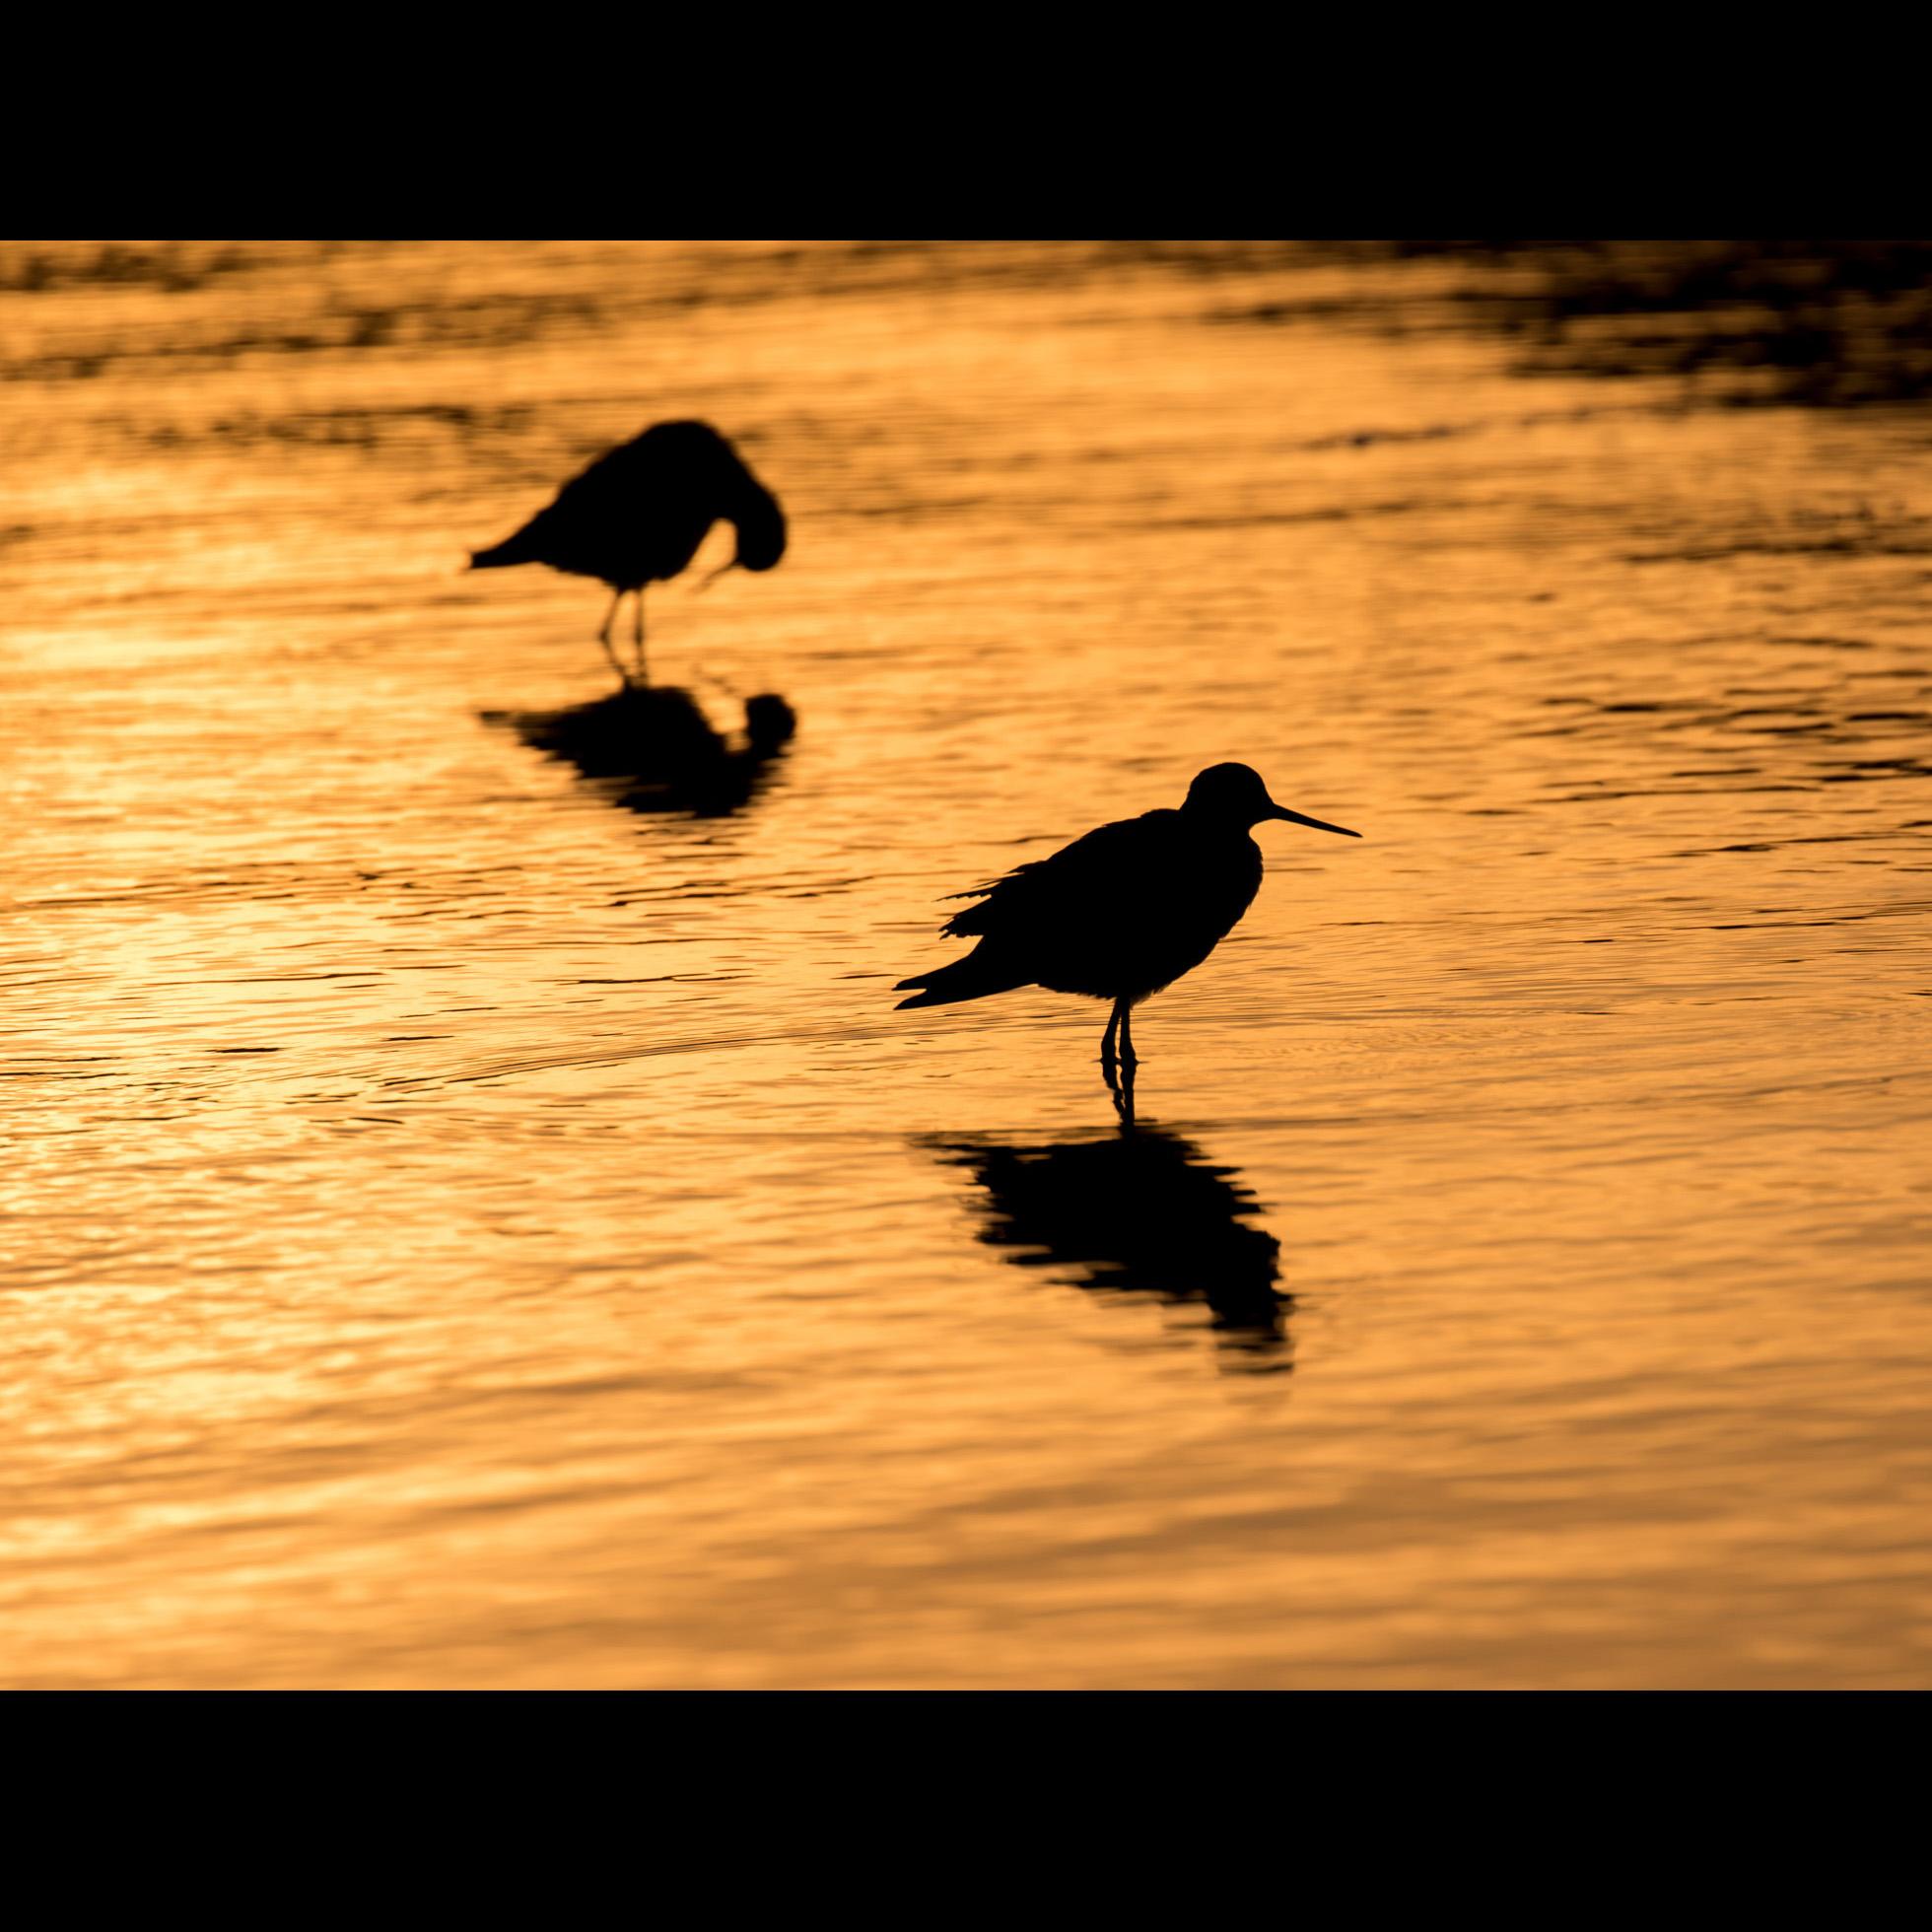 10.15 BIRDS AT SUNSET